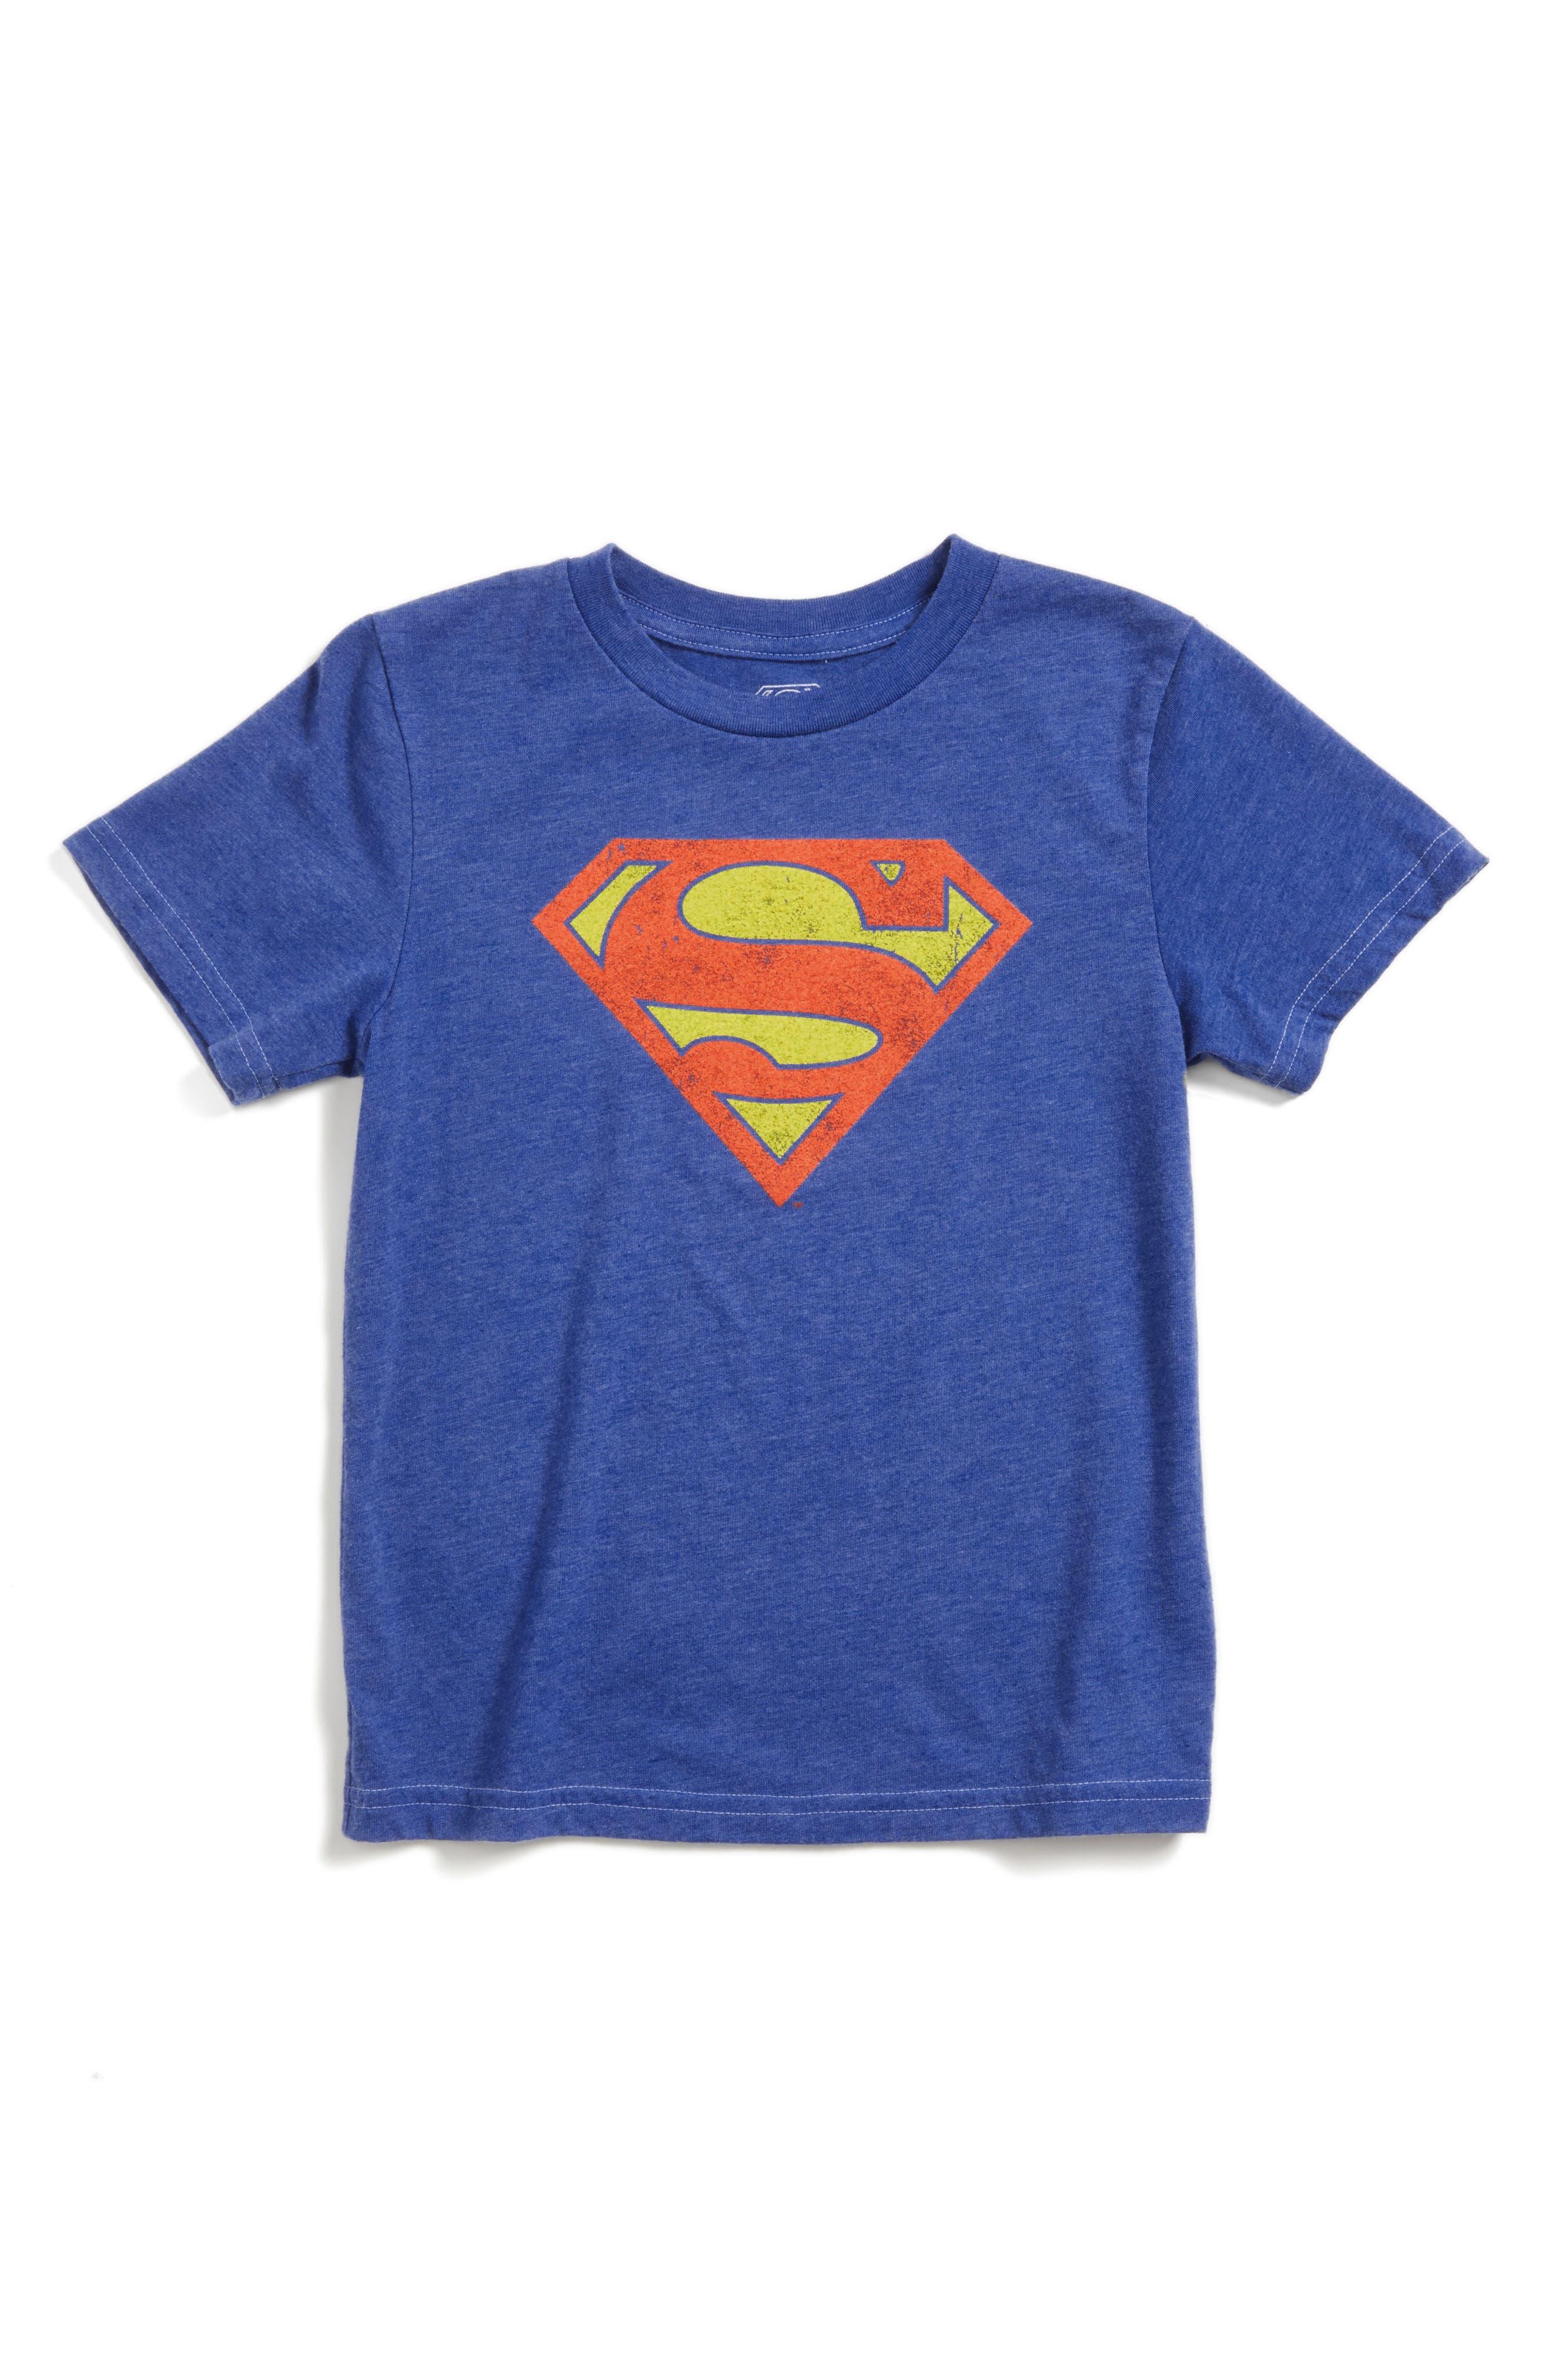 Main Image - Jem Superman Graphic T-Shirt (Toddler Boys, Little Boys & Big Boys)